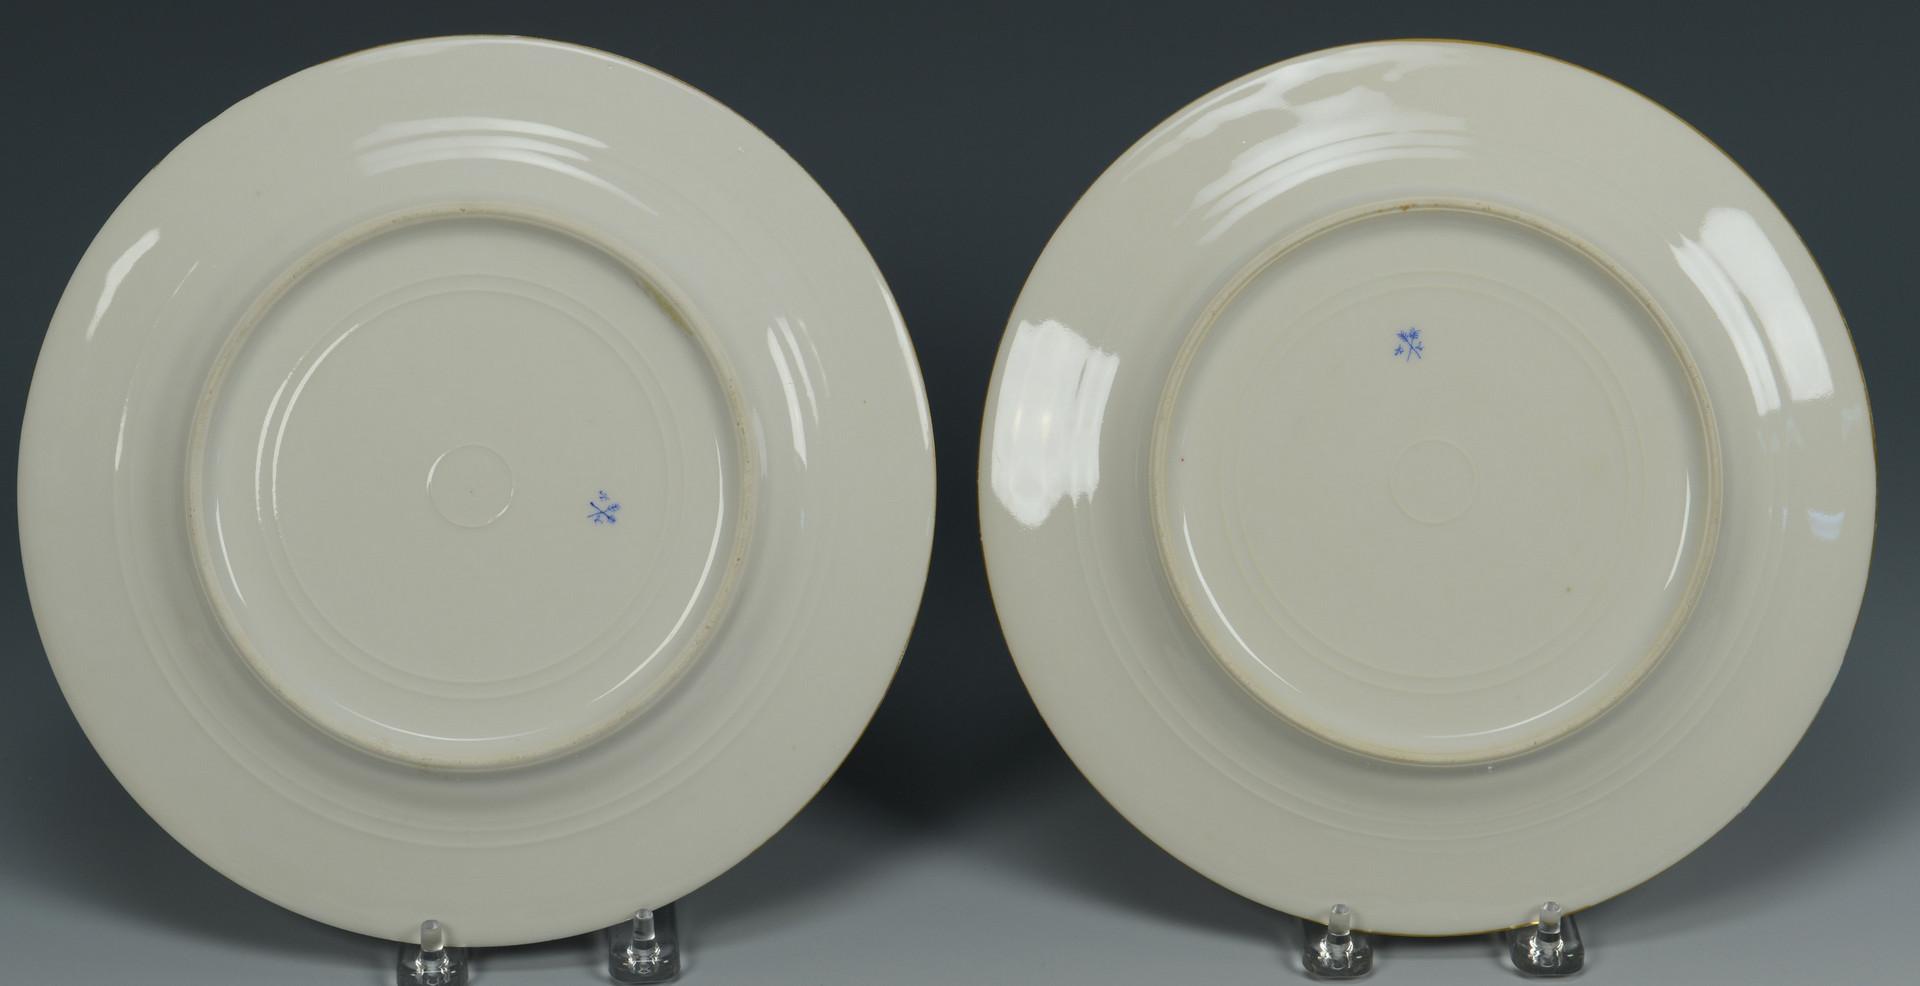 Lot 339: 8 French Porcelain Plates